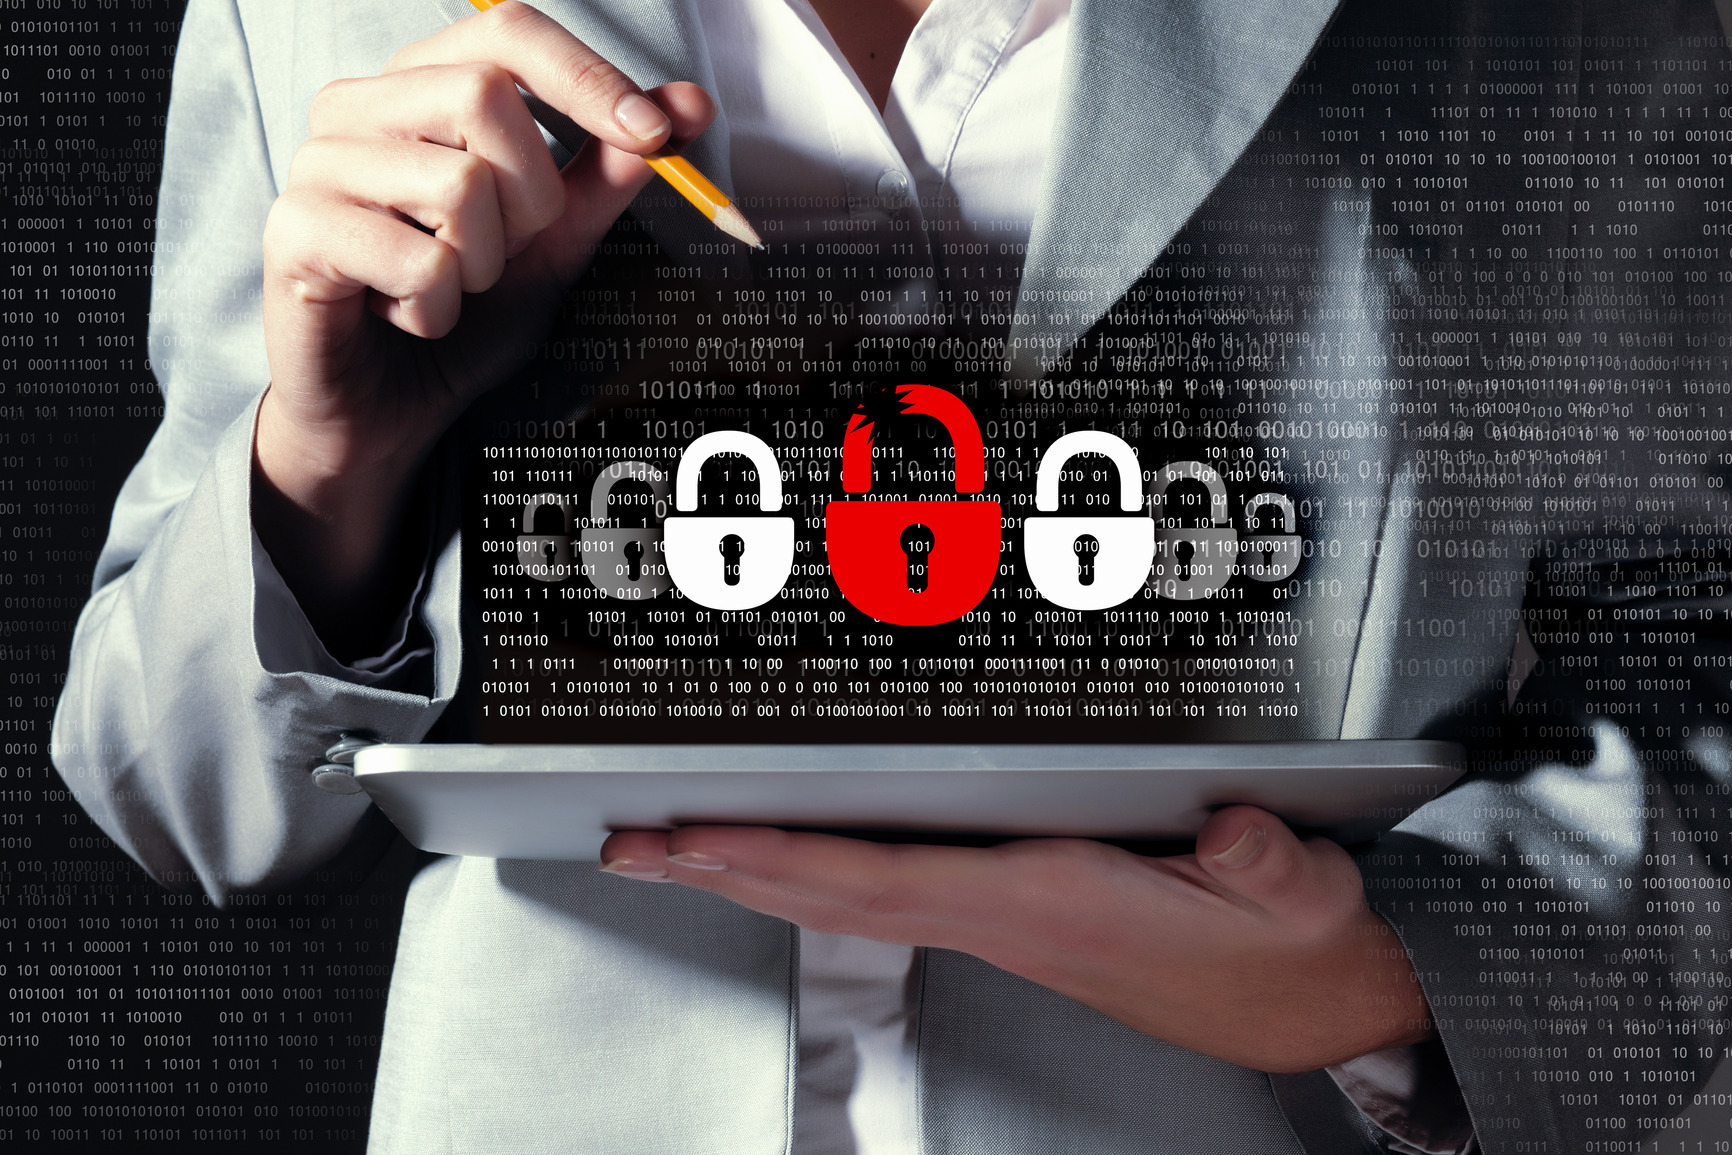 cryptolocker, virus, malware